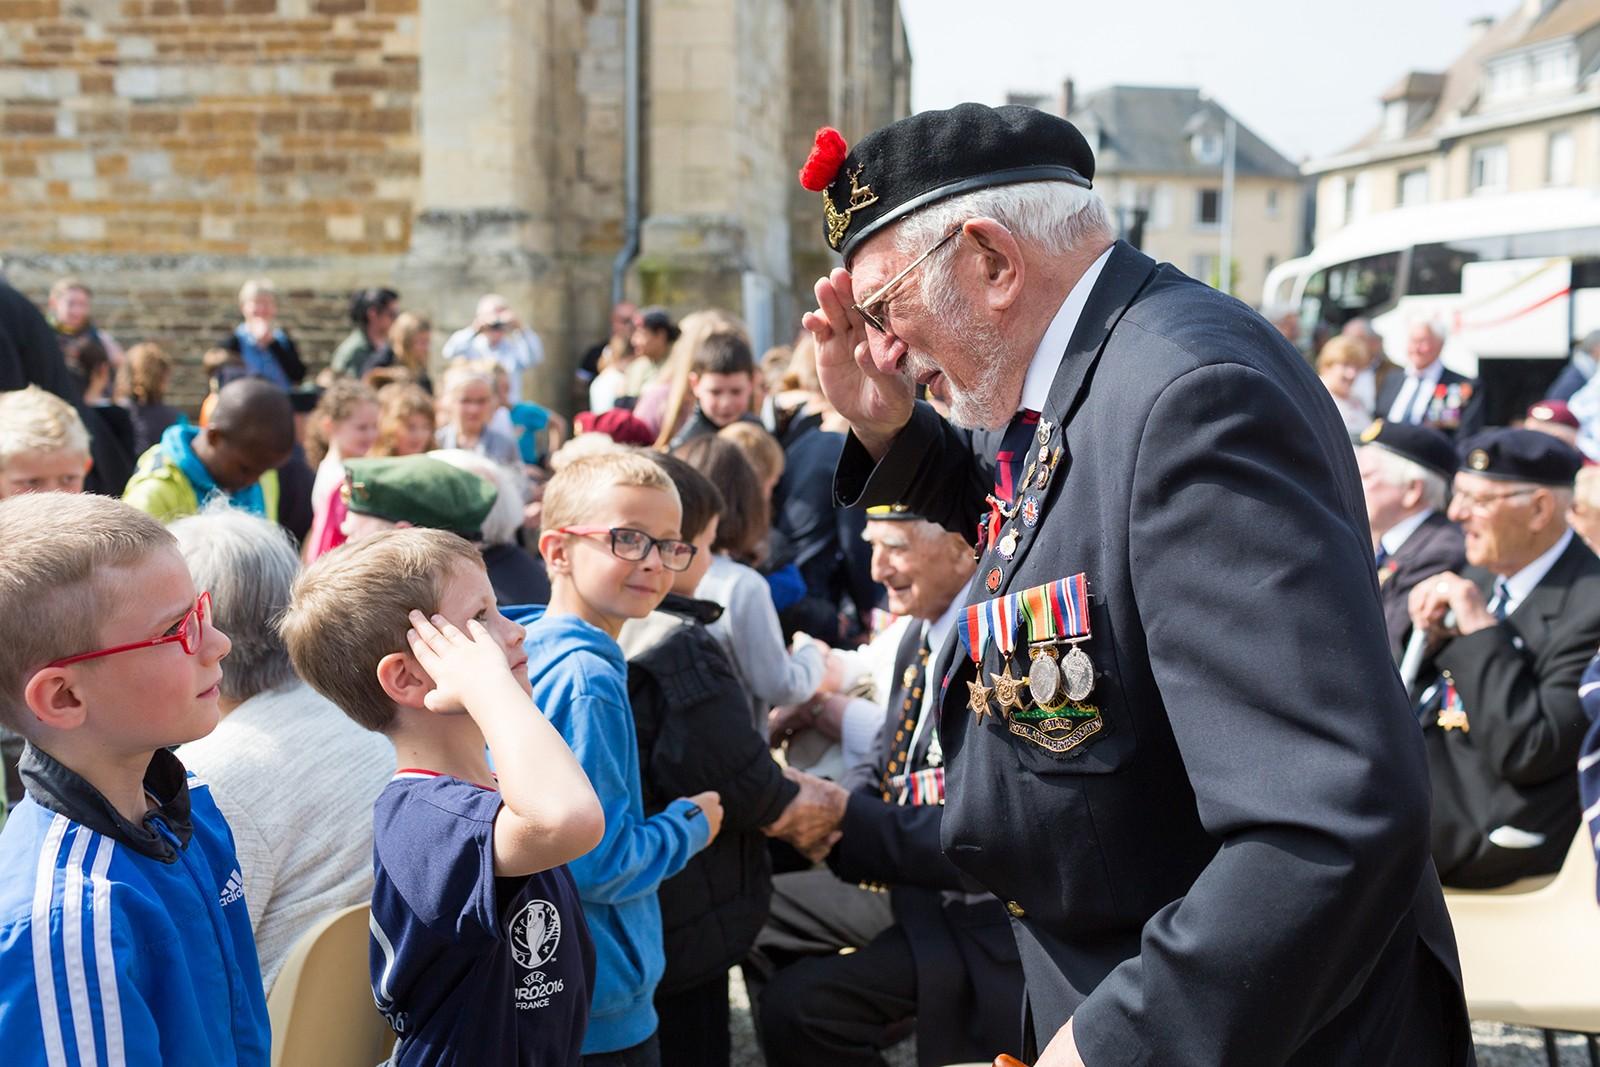 French school children meet D-Day Veterans